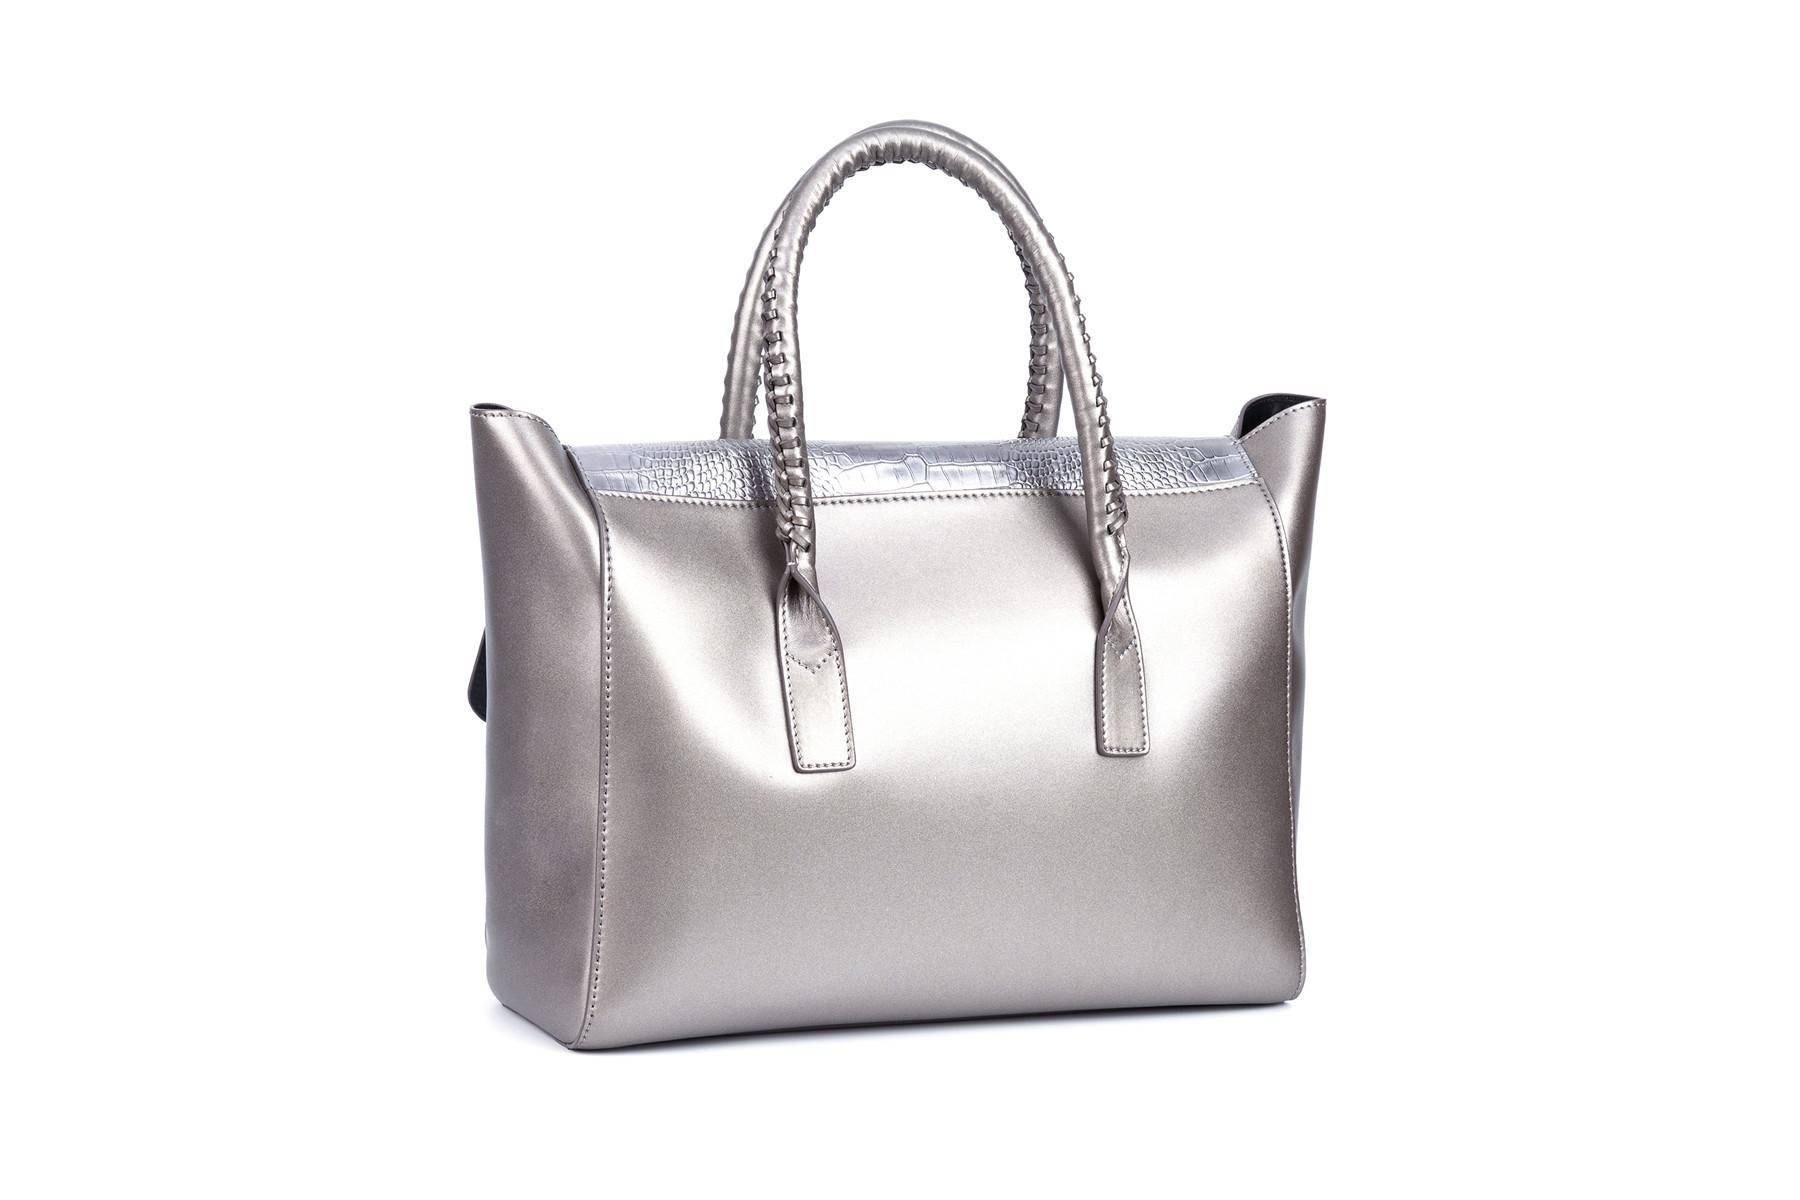 GF bags-Bulk Luxury Handbags Manufacturer, Affordable Handbags   Gf Bags-2